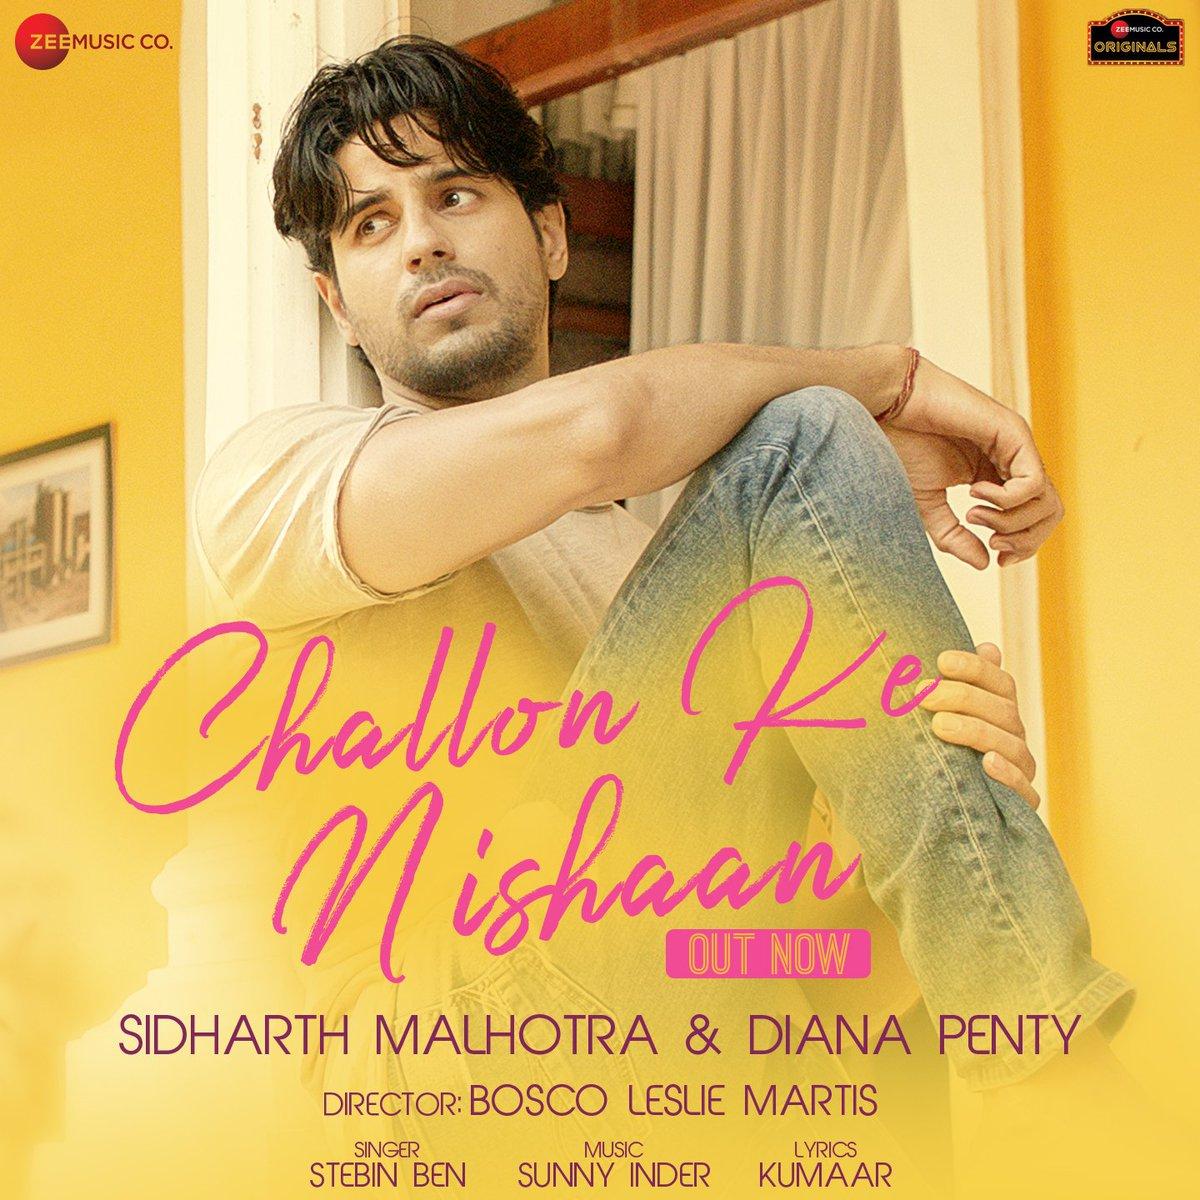 वक्त बेवफ़ाई ना करता  तो हम साथ होते  तनहाइयों की जगह आज  हाथ में तेरे हाथ होते #ChallonKeNishaan song is OUT  NOW!! . >>  . #ZeeMusicOriginals @SidMalhotra @DianaPenty @kumaarofficial #SunnyInder @BoscoMartis @anuragbedi @zeemusiccompany